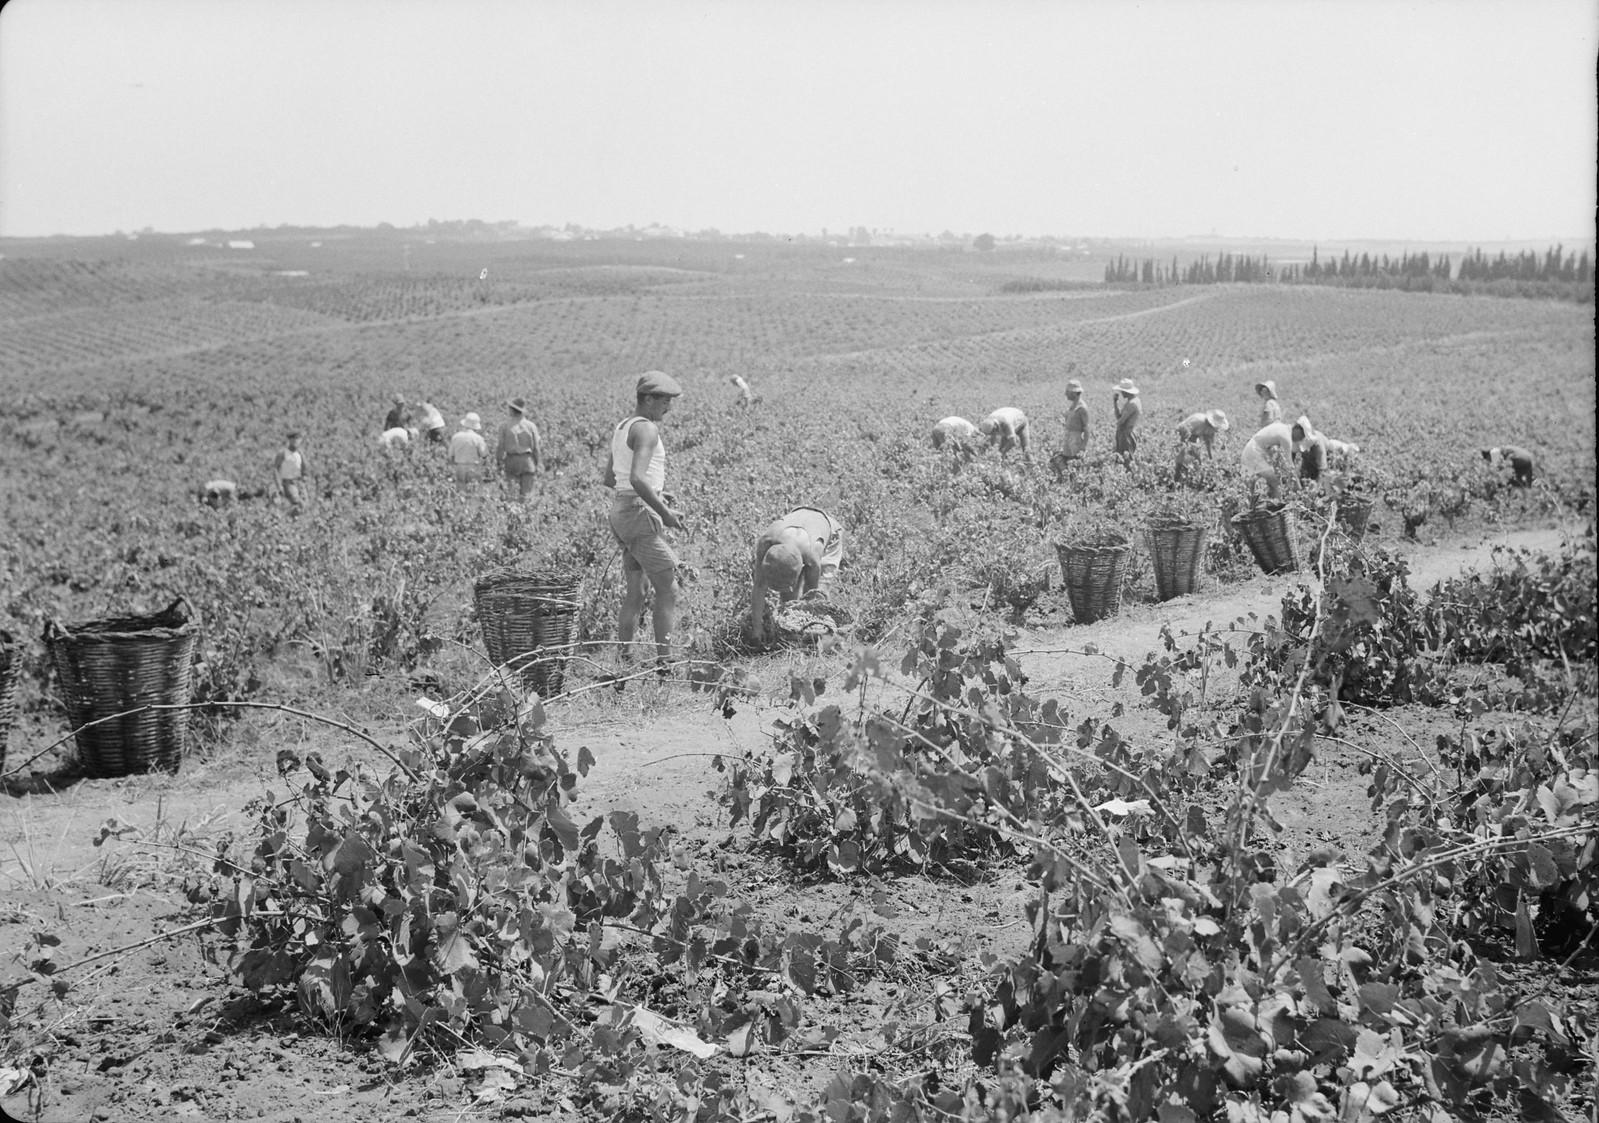 16. Общий вид виноградников во время сбора винограда